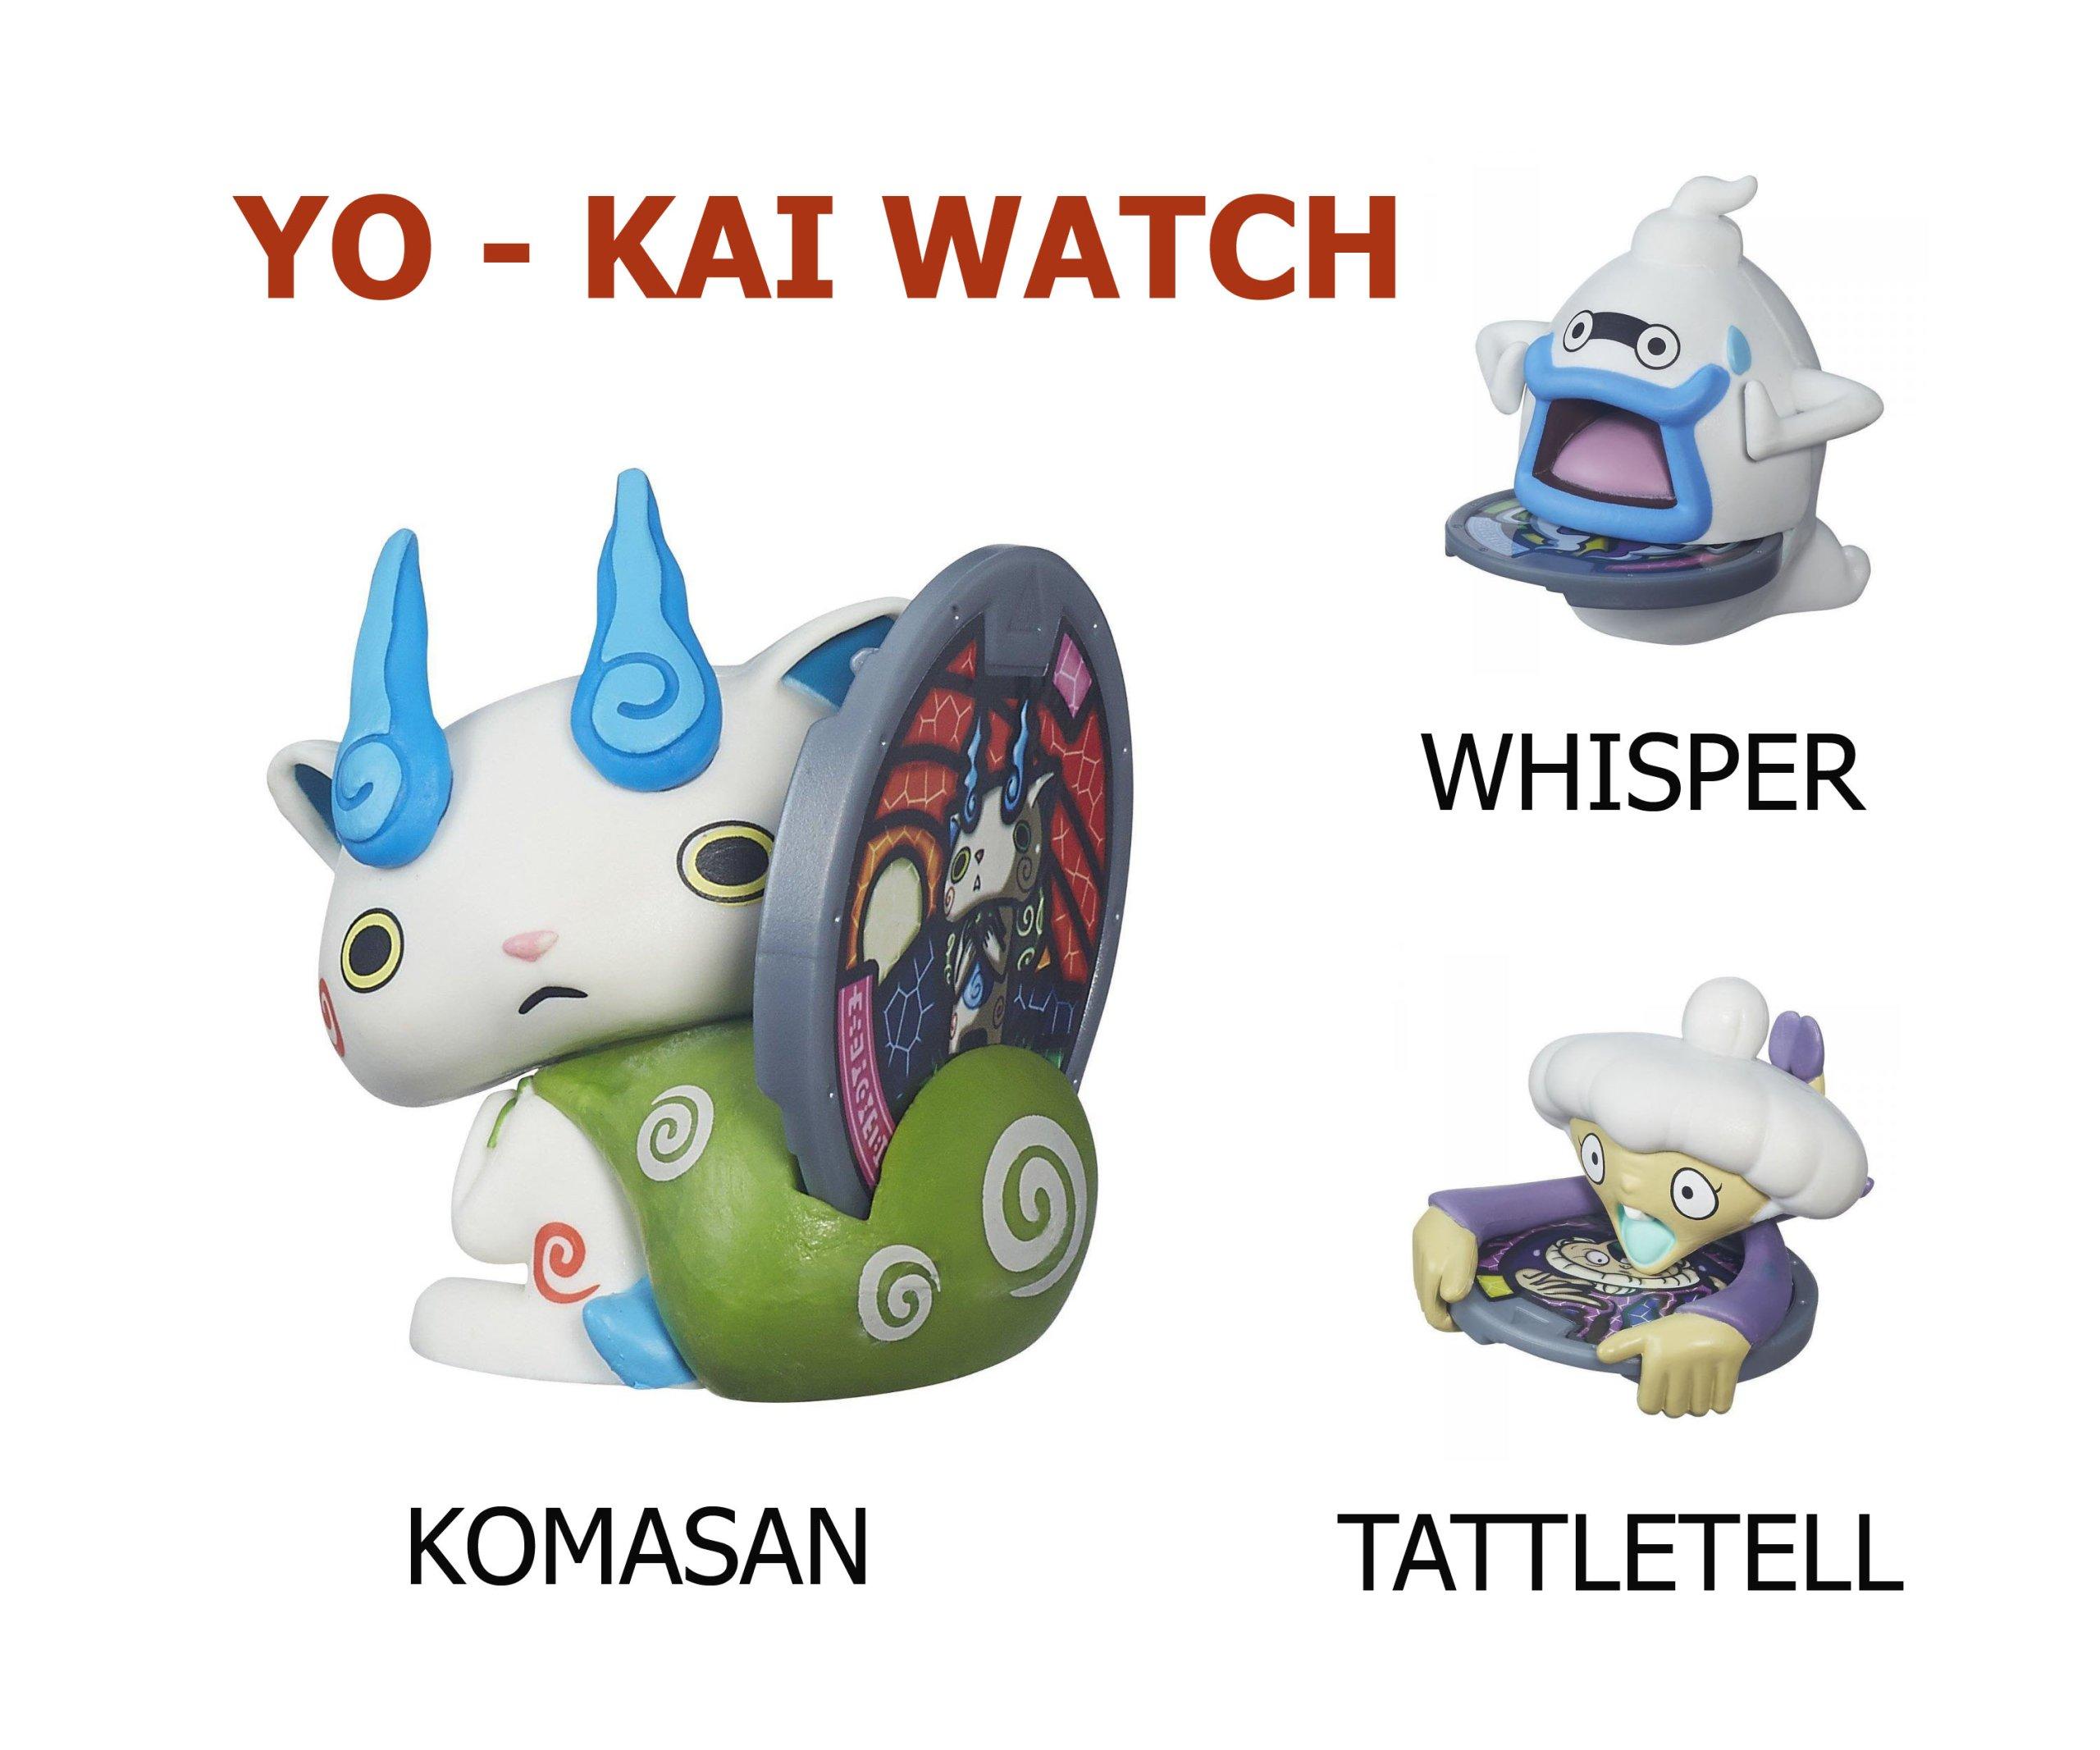 HASBRO KOMASAN WHISPER TATTLETELL YO-KAI_3 kusov